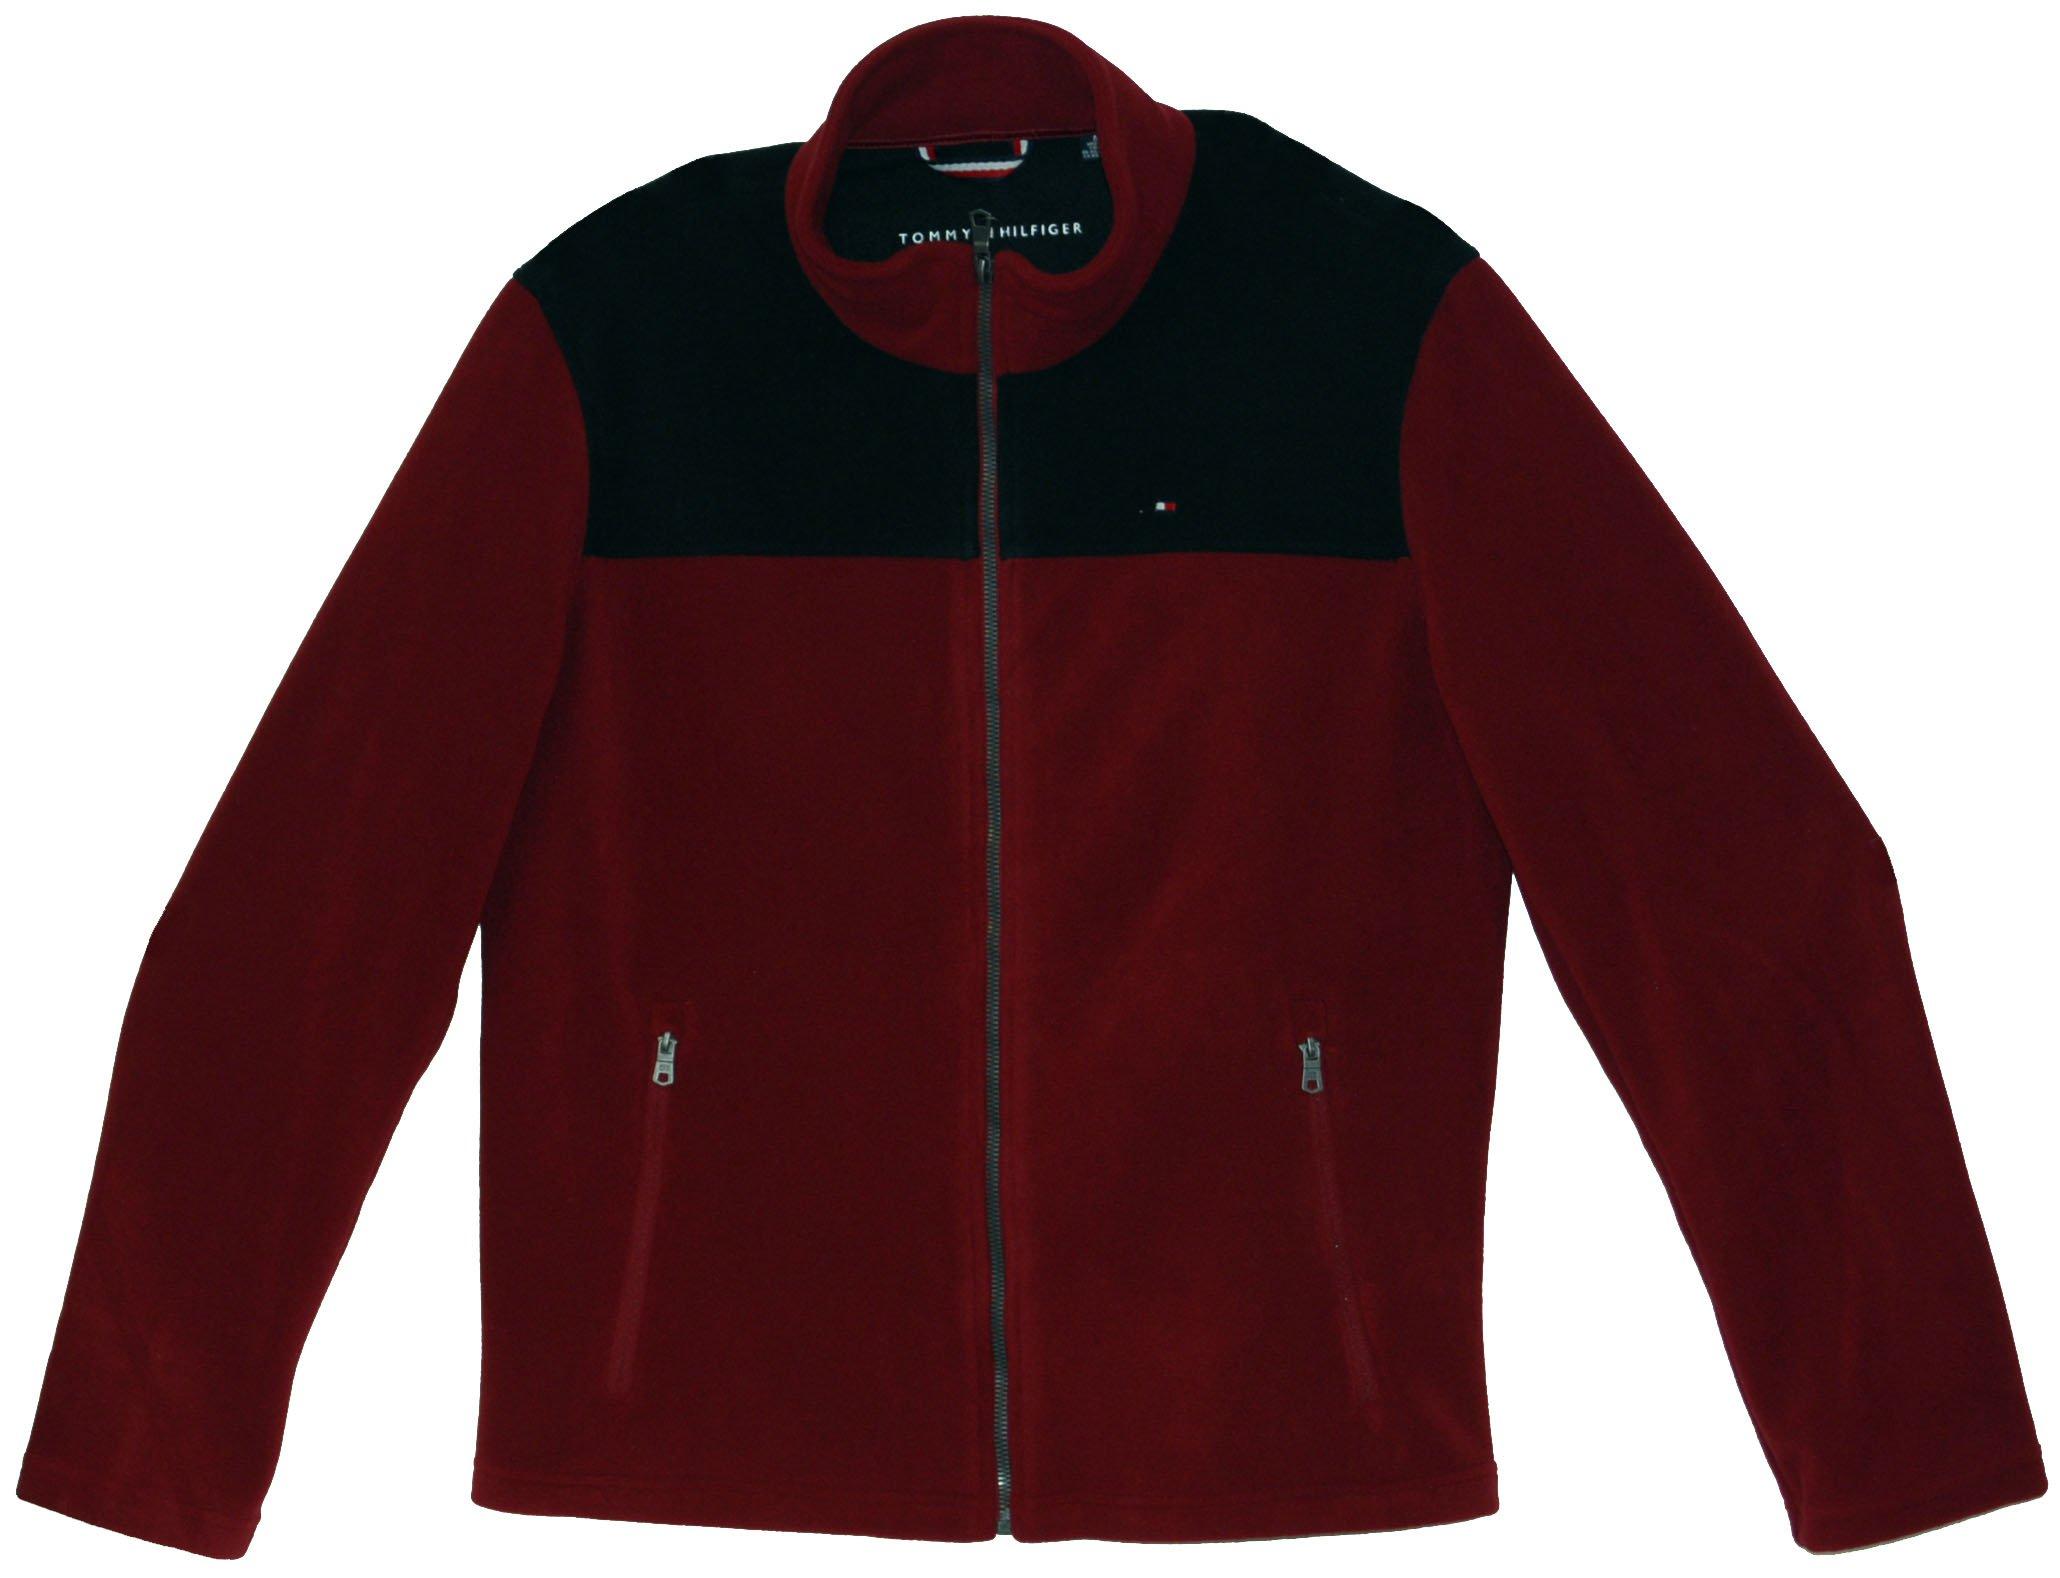 Tommy Hilfiger Mens Full-Zip Sweater (L, Red/Black)